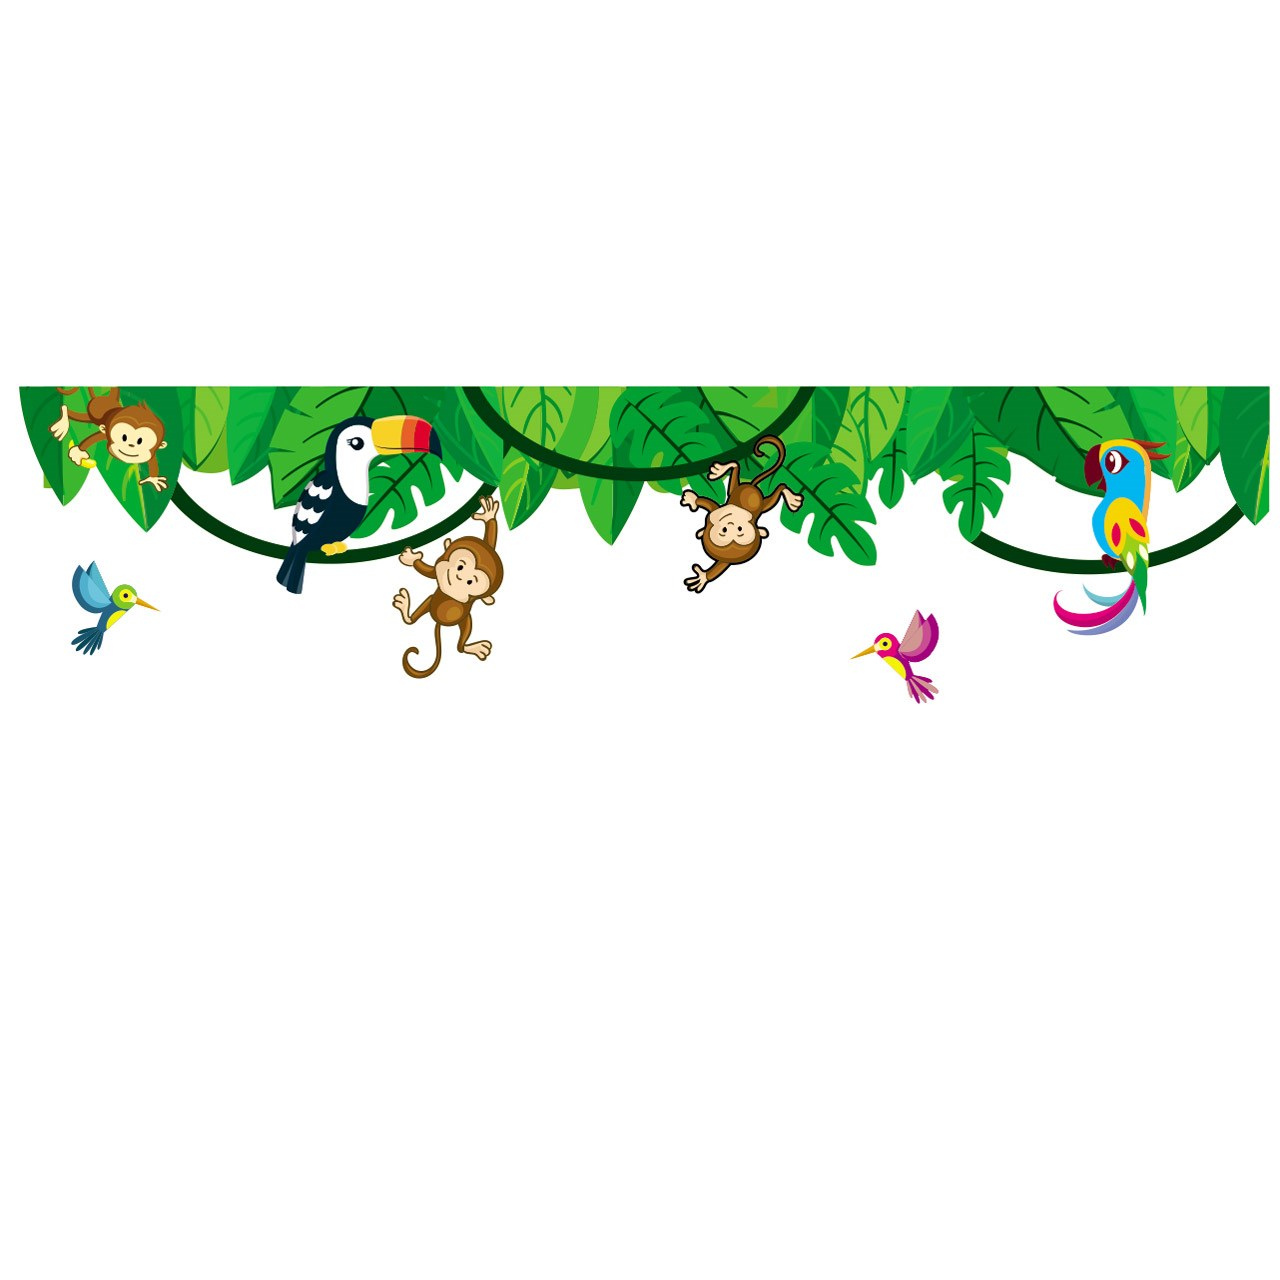 استیکر چوبی جیک جیک مدل جنگل آمازون